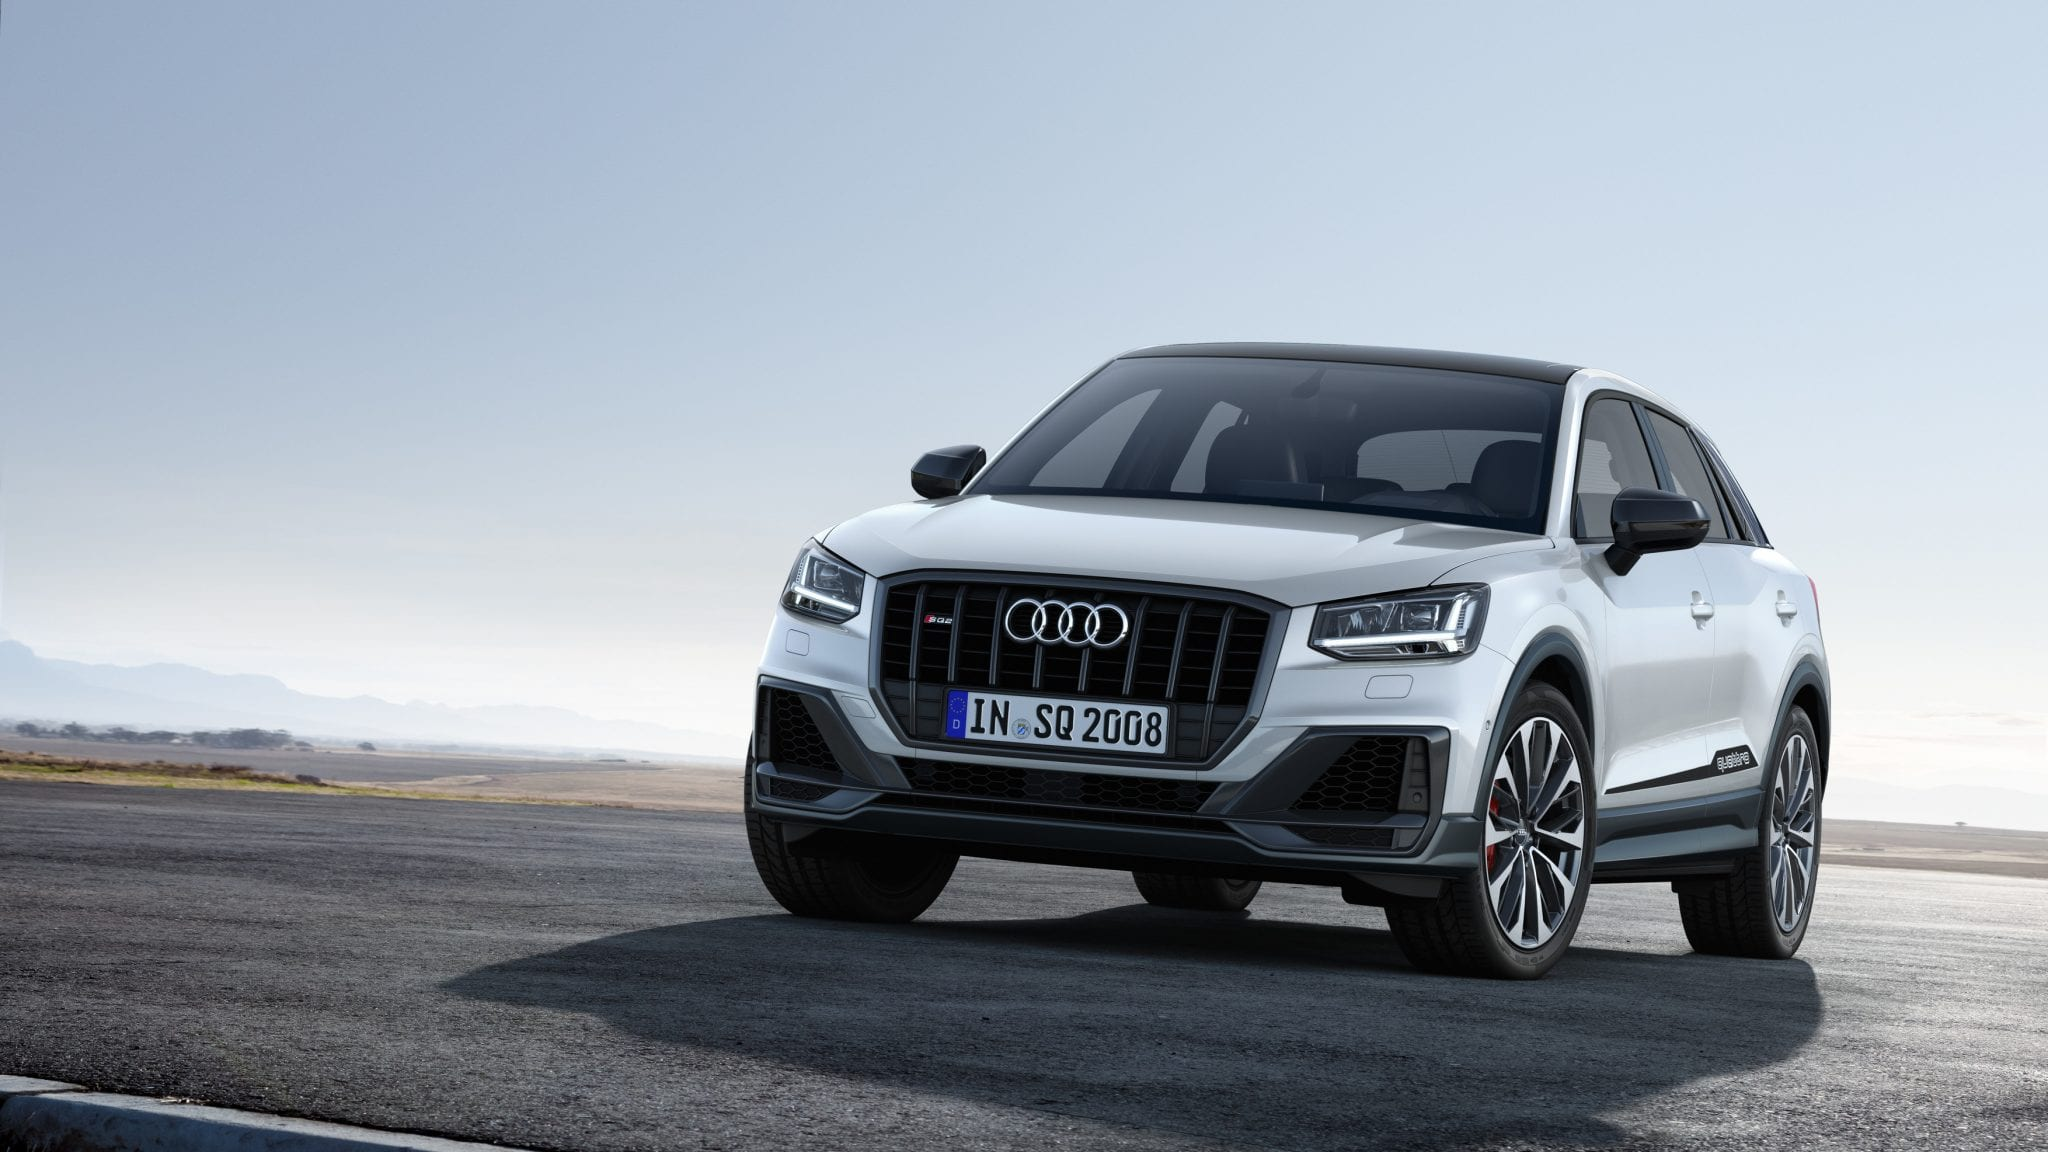 Potvrdené! Audi SQ2 dostane motor 2.0 TFSI a 300 koní!